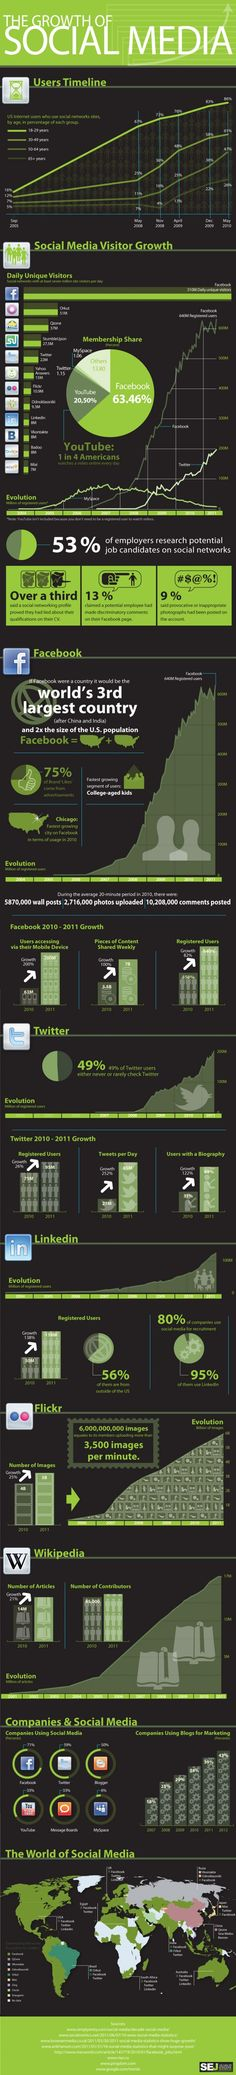 social-media-apps #social #media #apps #growth #infographic